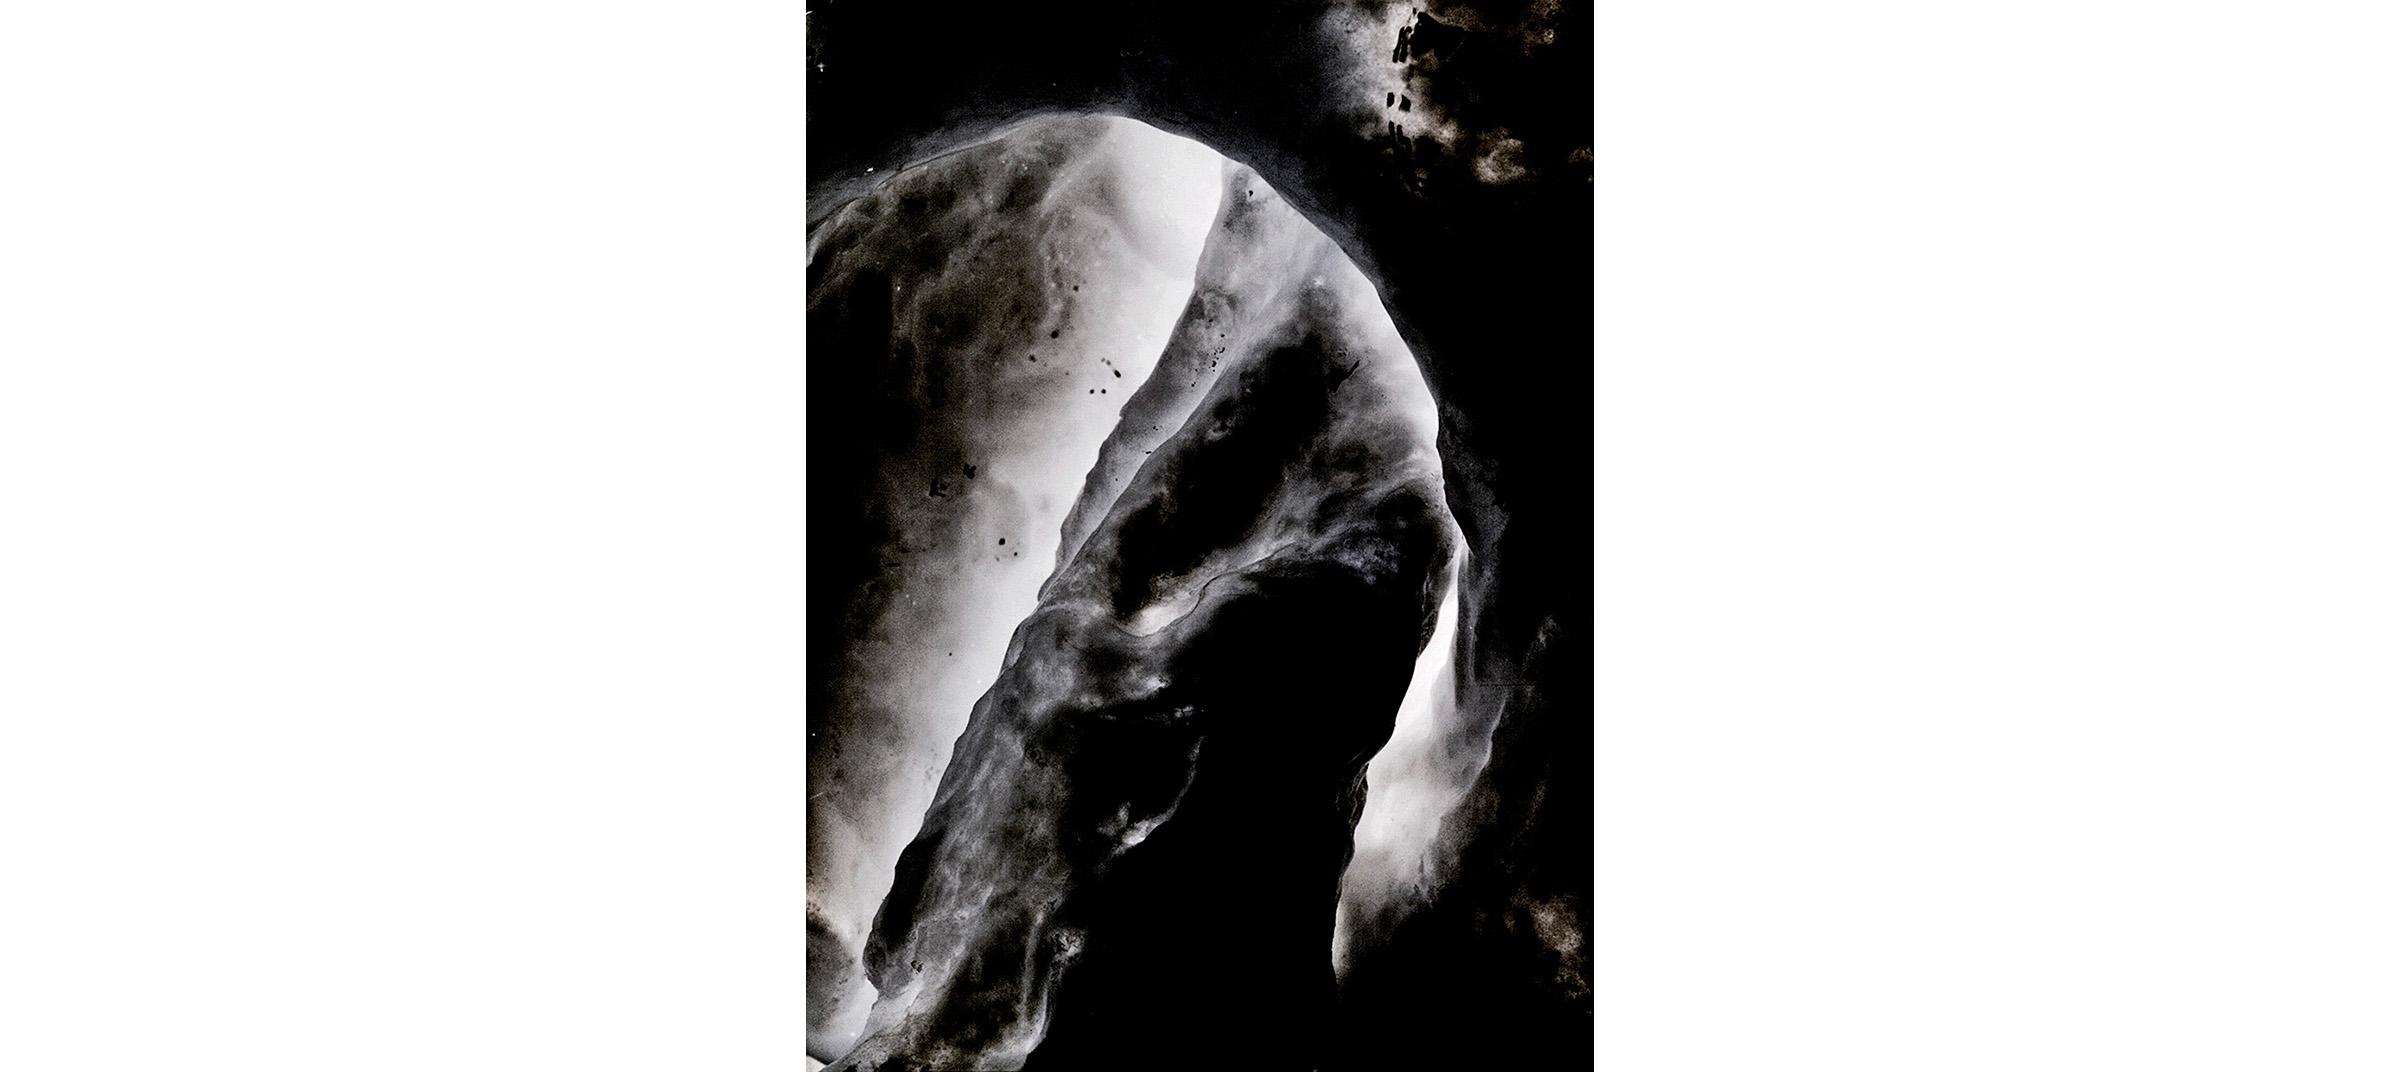 X 23  Untitled N°4, 2014/2015 Tirage gélatino argentique, 144 x 104 cm |Gelatin silver print, 56,69 x 40,94 inches  2/4